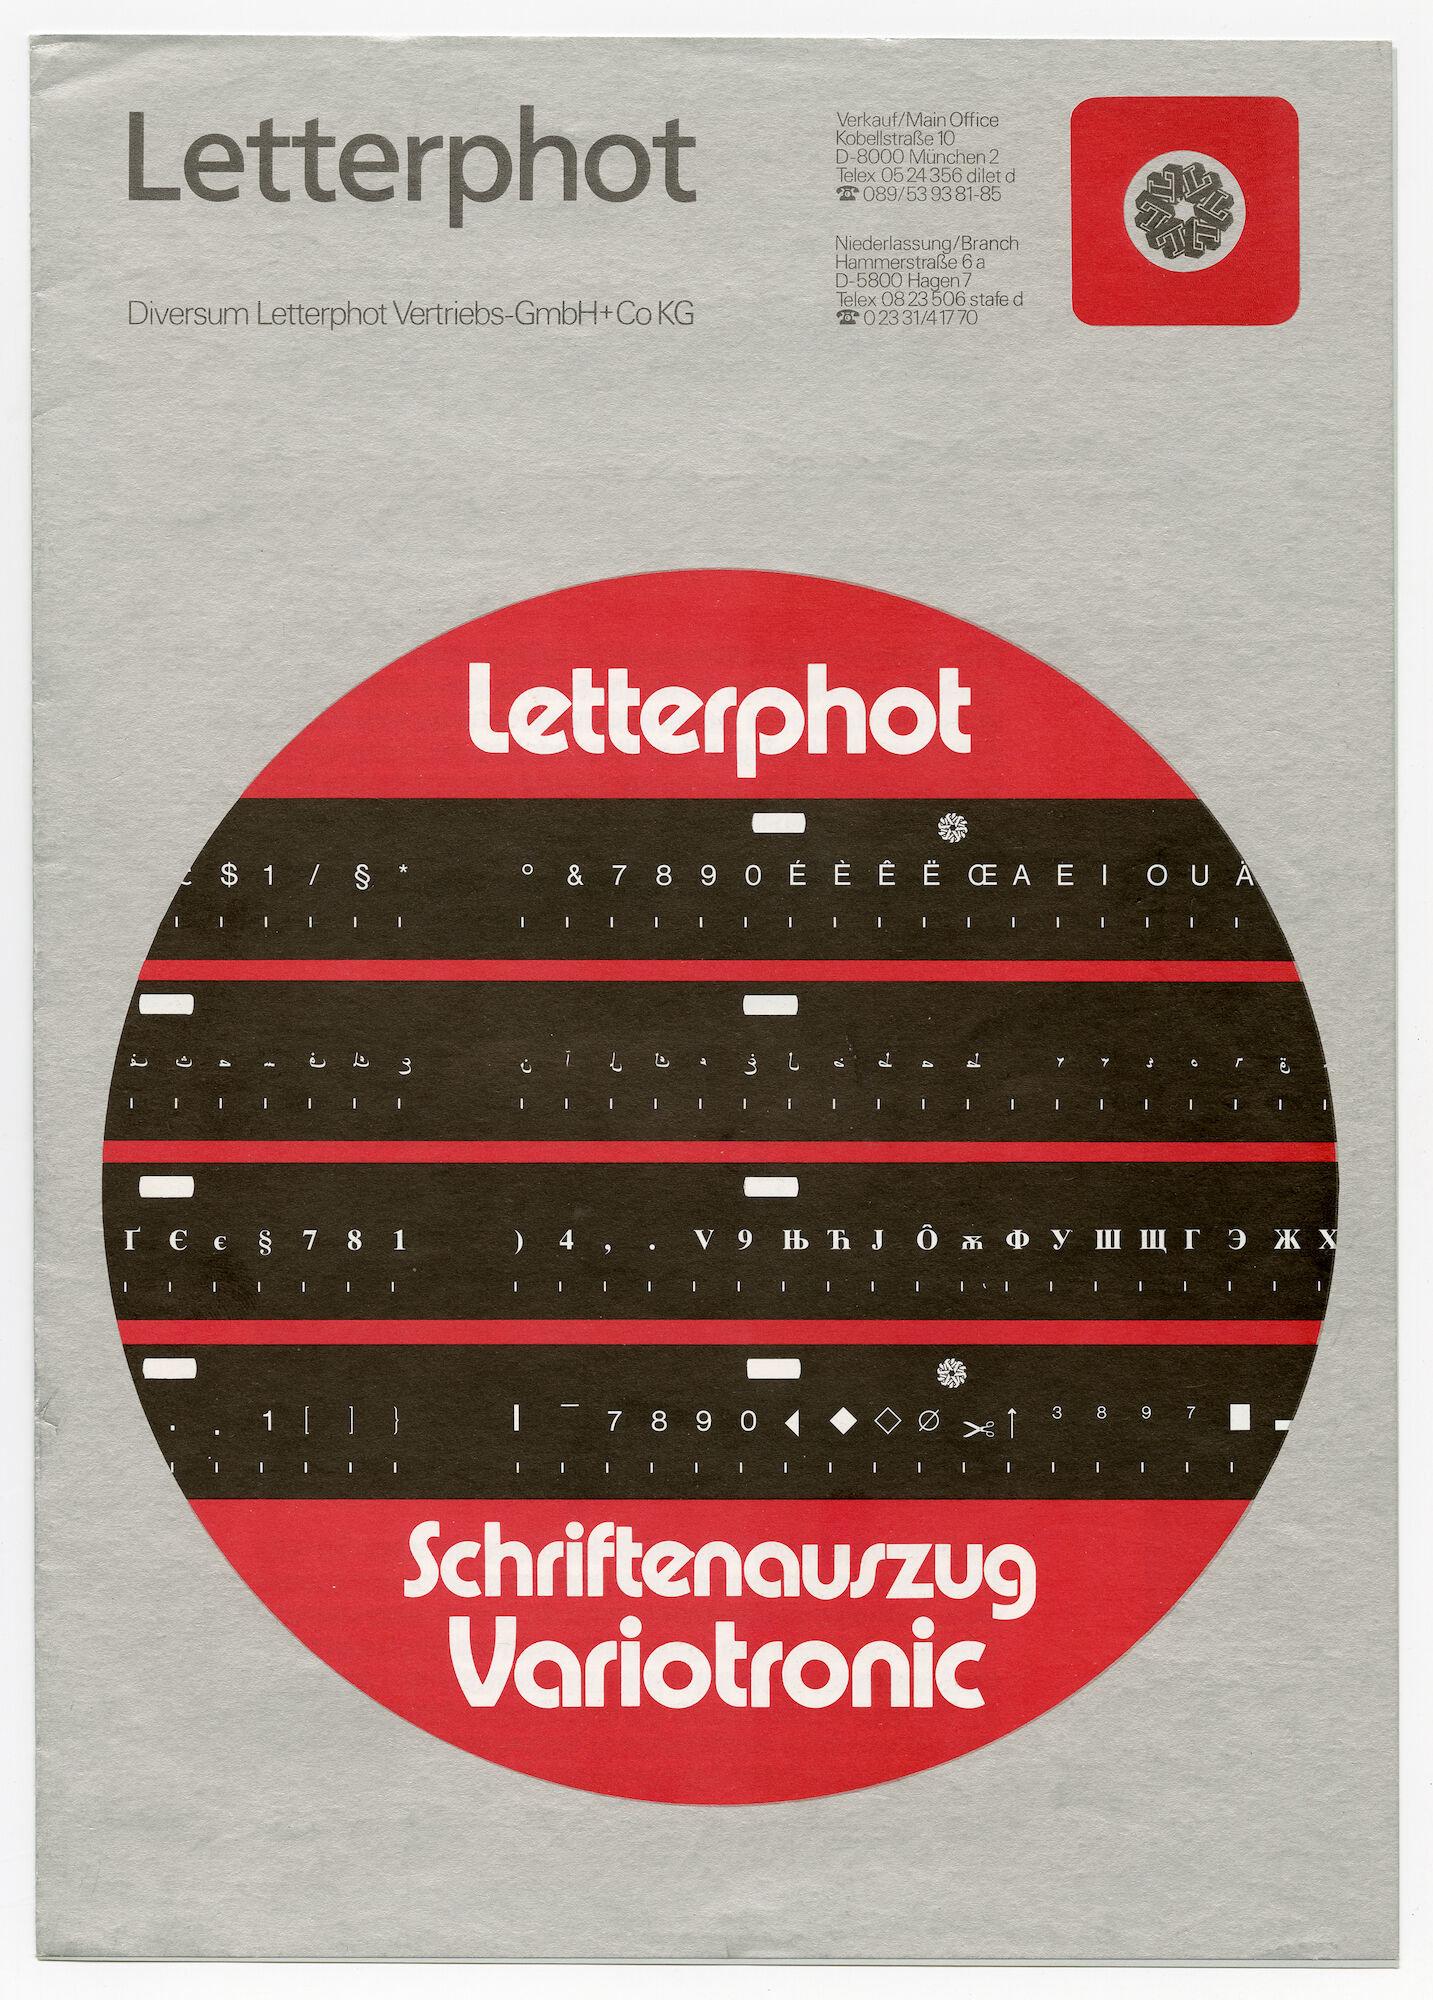 Letterproef met lettertypes voor Letterphot Variotronic